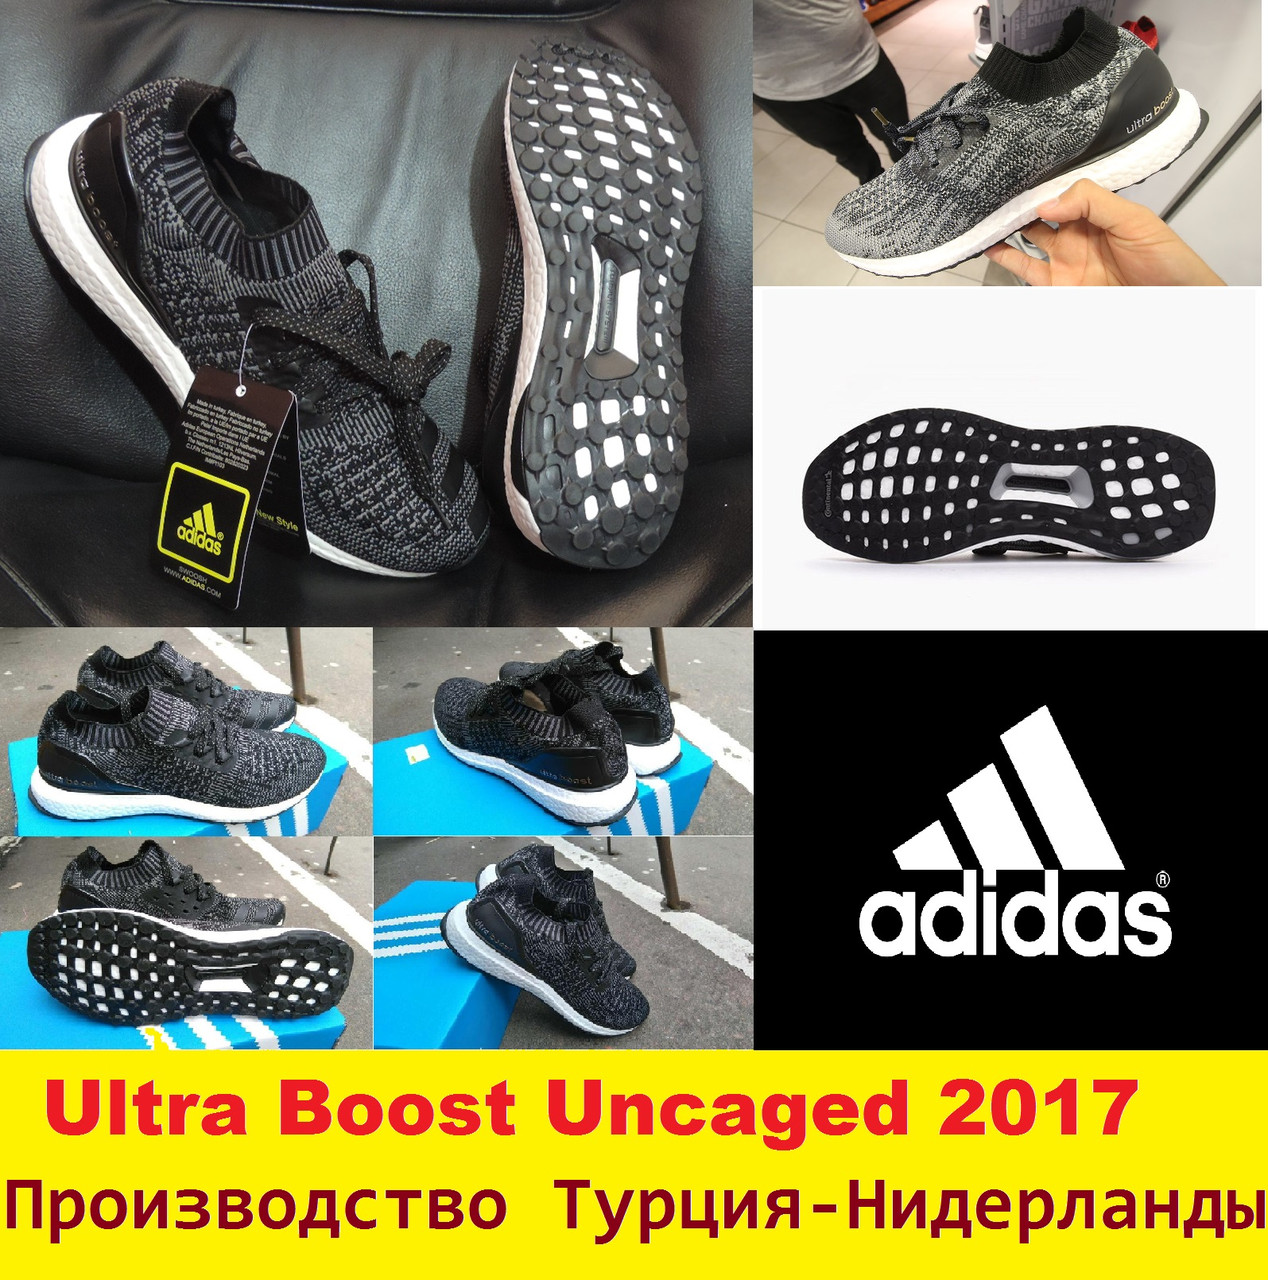 5ebe9e77 Мужские кроссовки Adidas Ultra Boost Uncaged (Адидас Ультра Буст). Беговые  кроссовки.